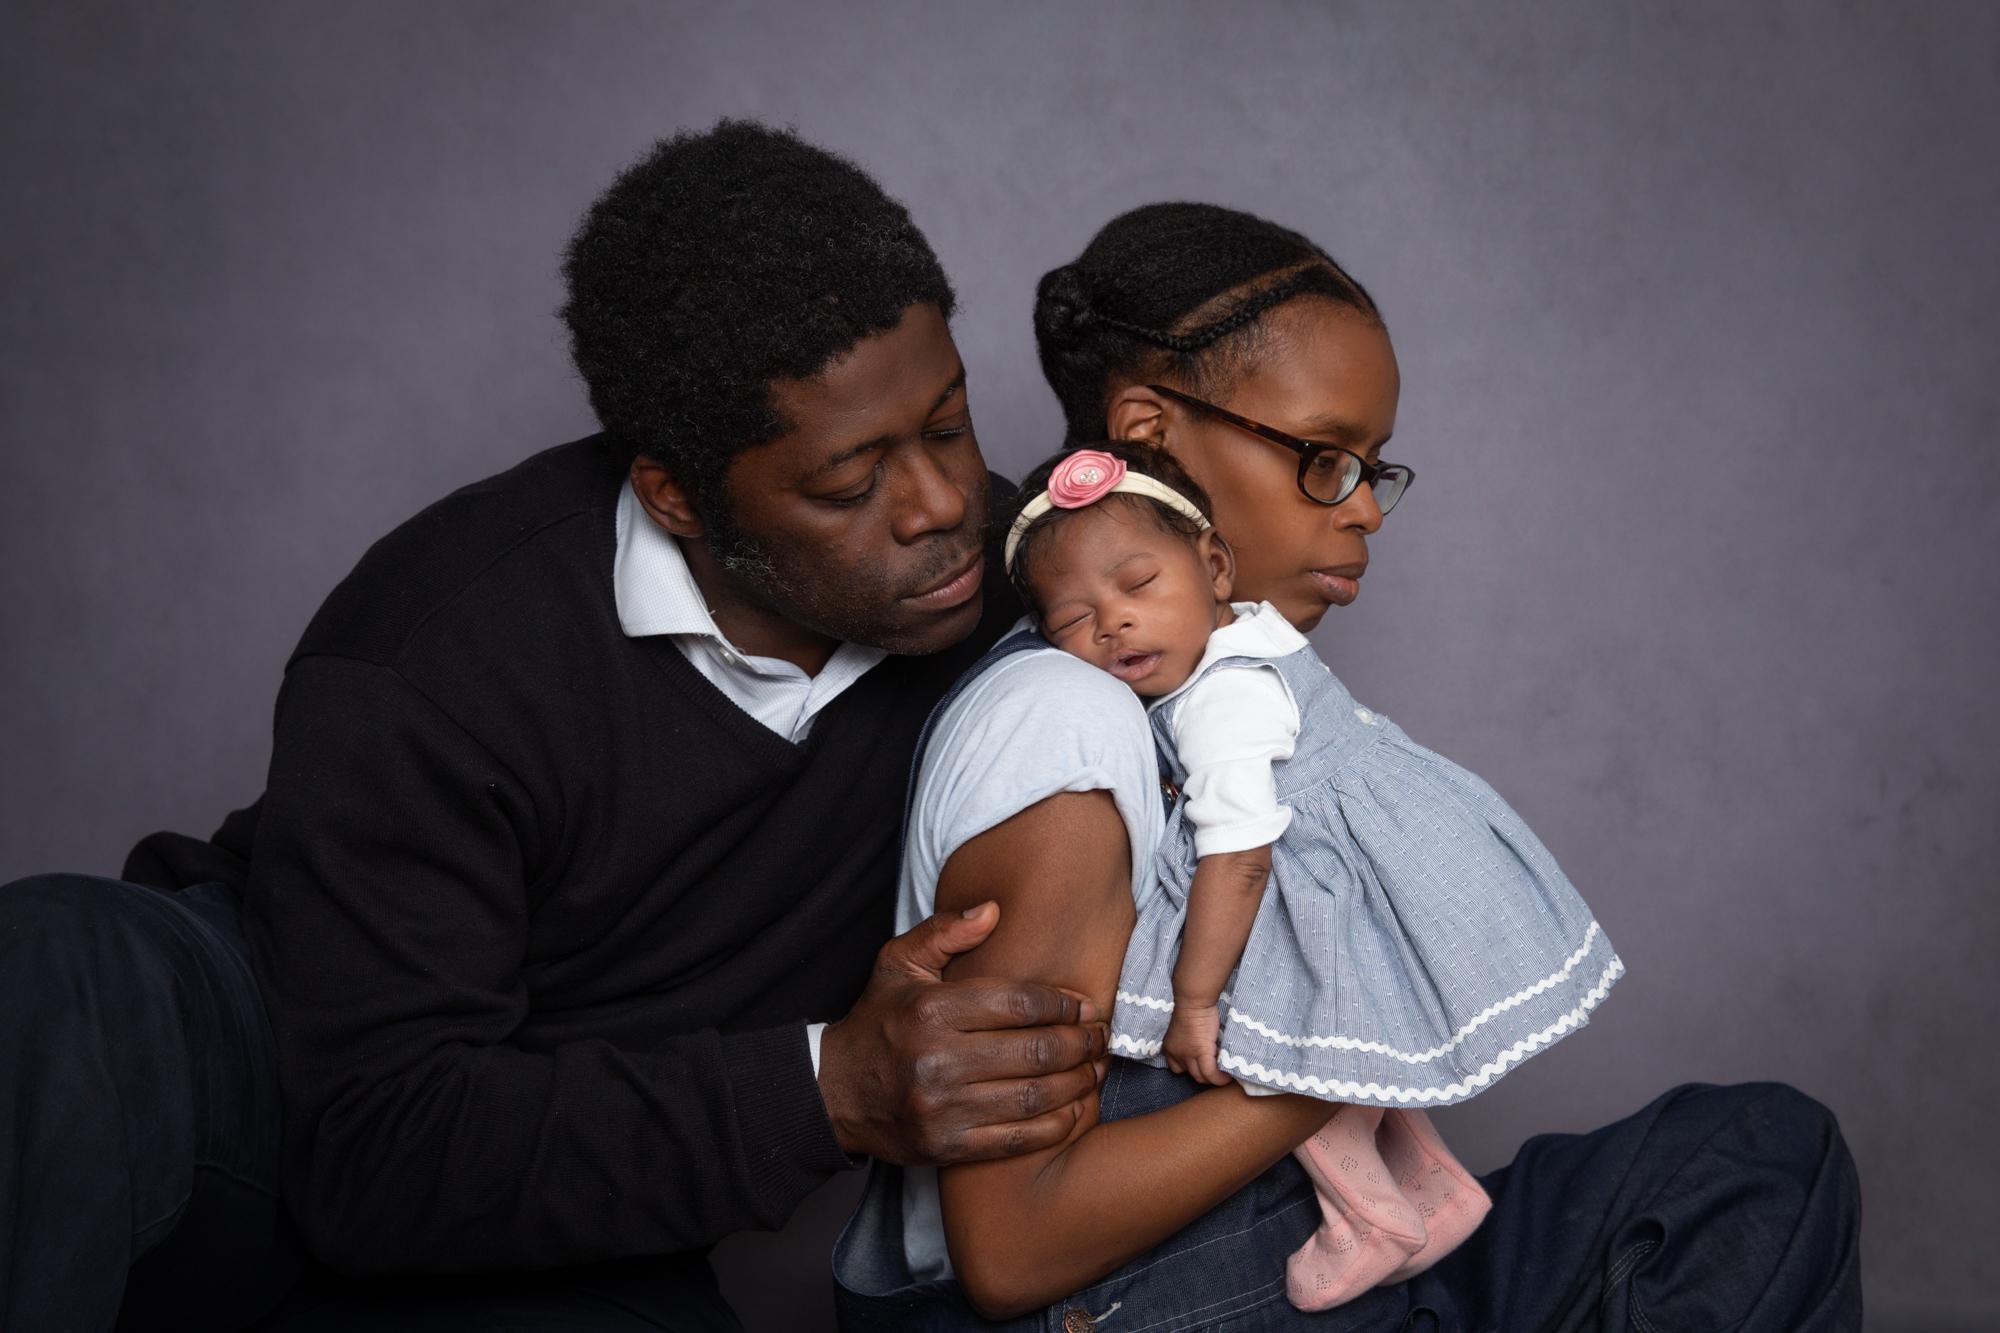 London newborn & family photographer